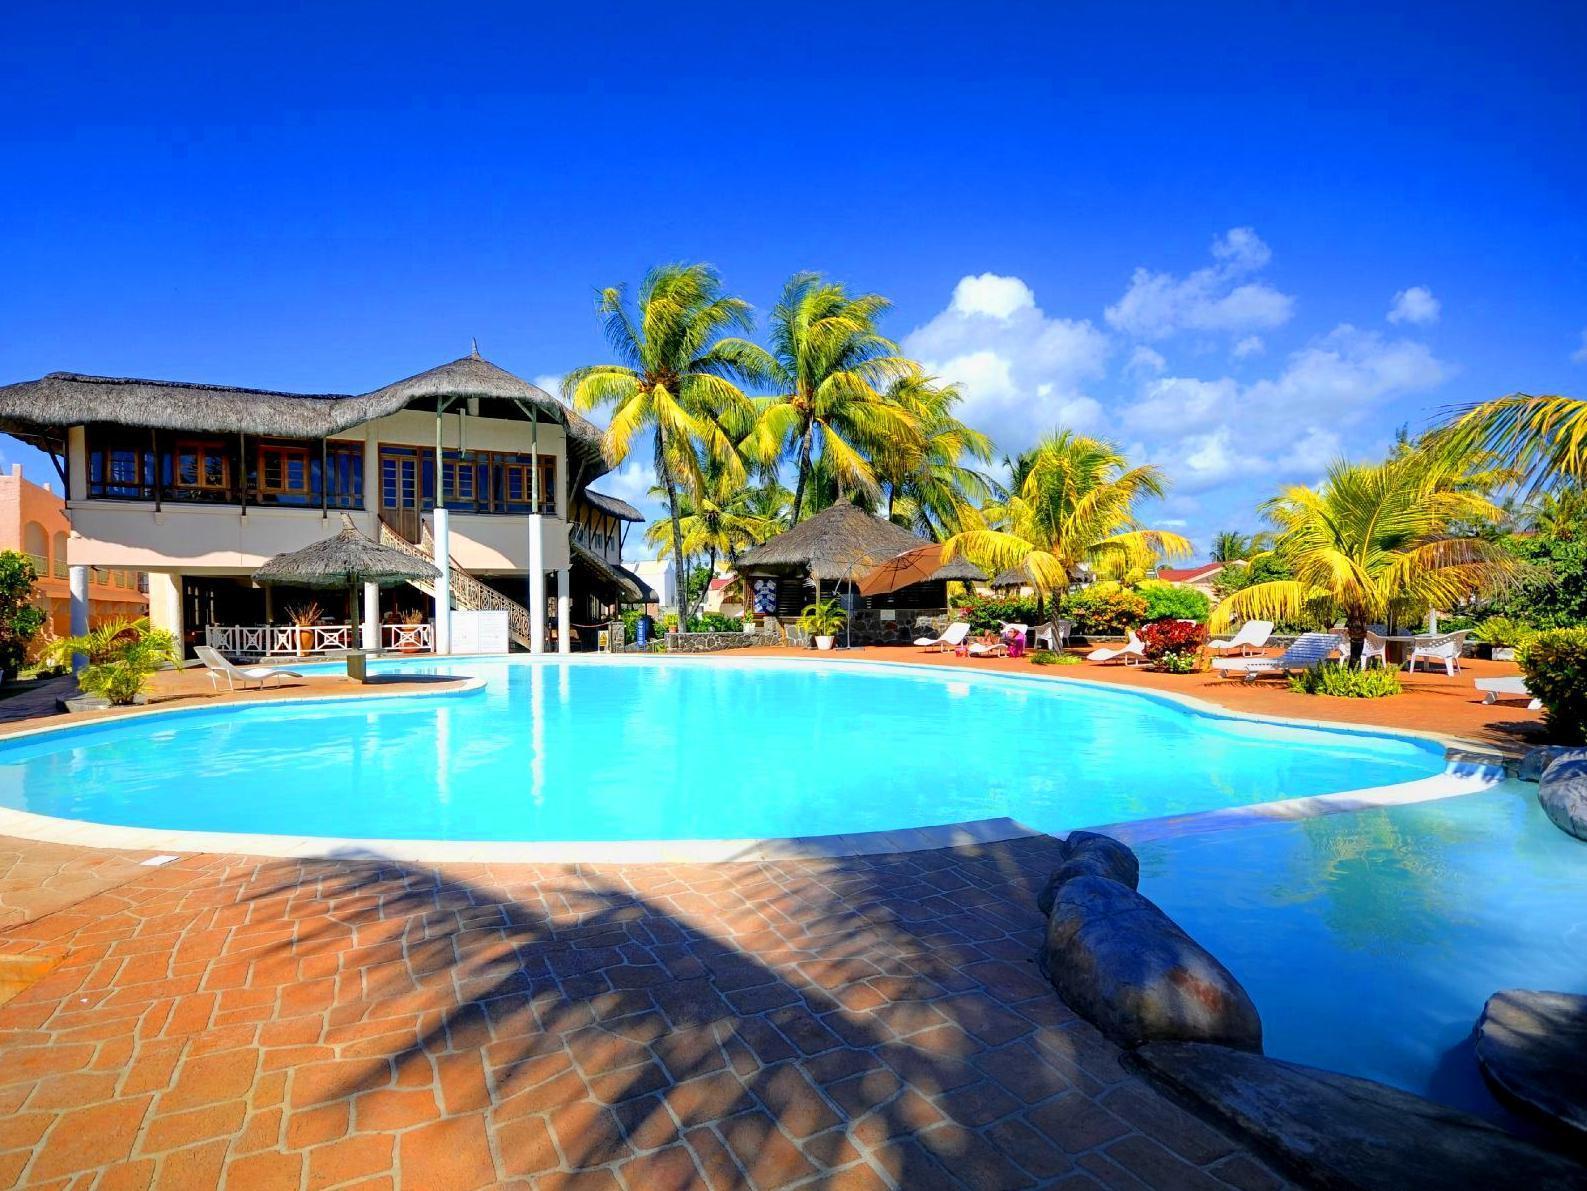 Casa Florida Hotel & Spa